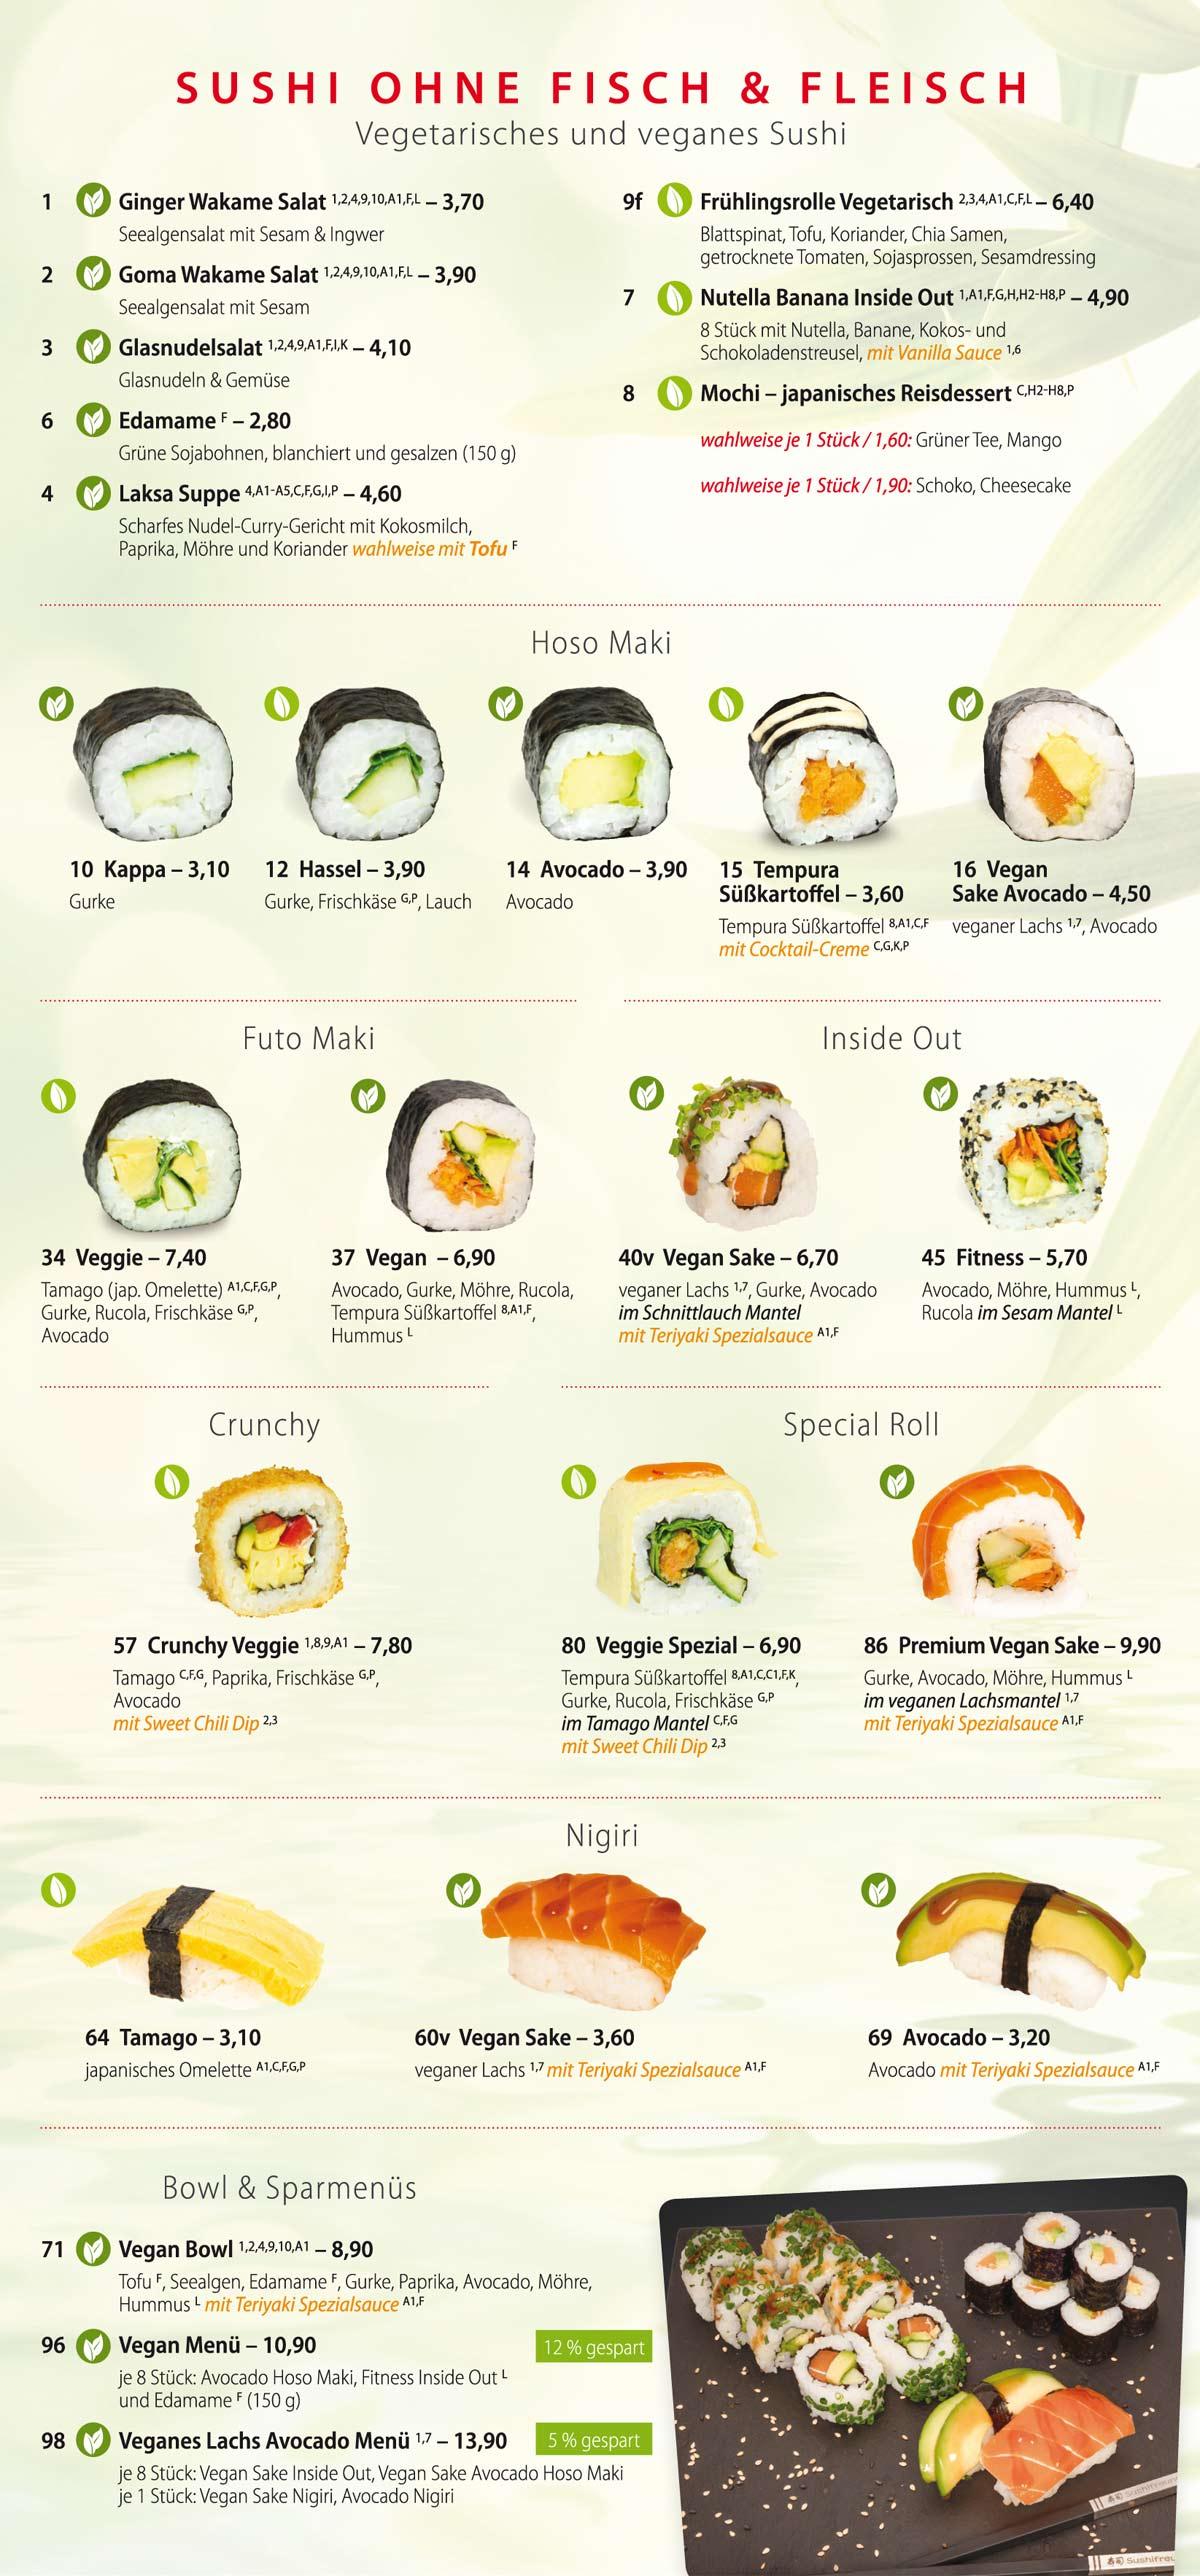 Sushifreunde Speisekarte | Vegetarisches & Veganes Sushiangebot